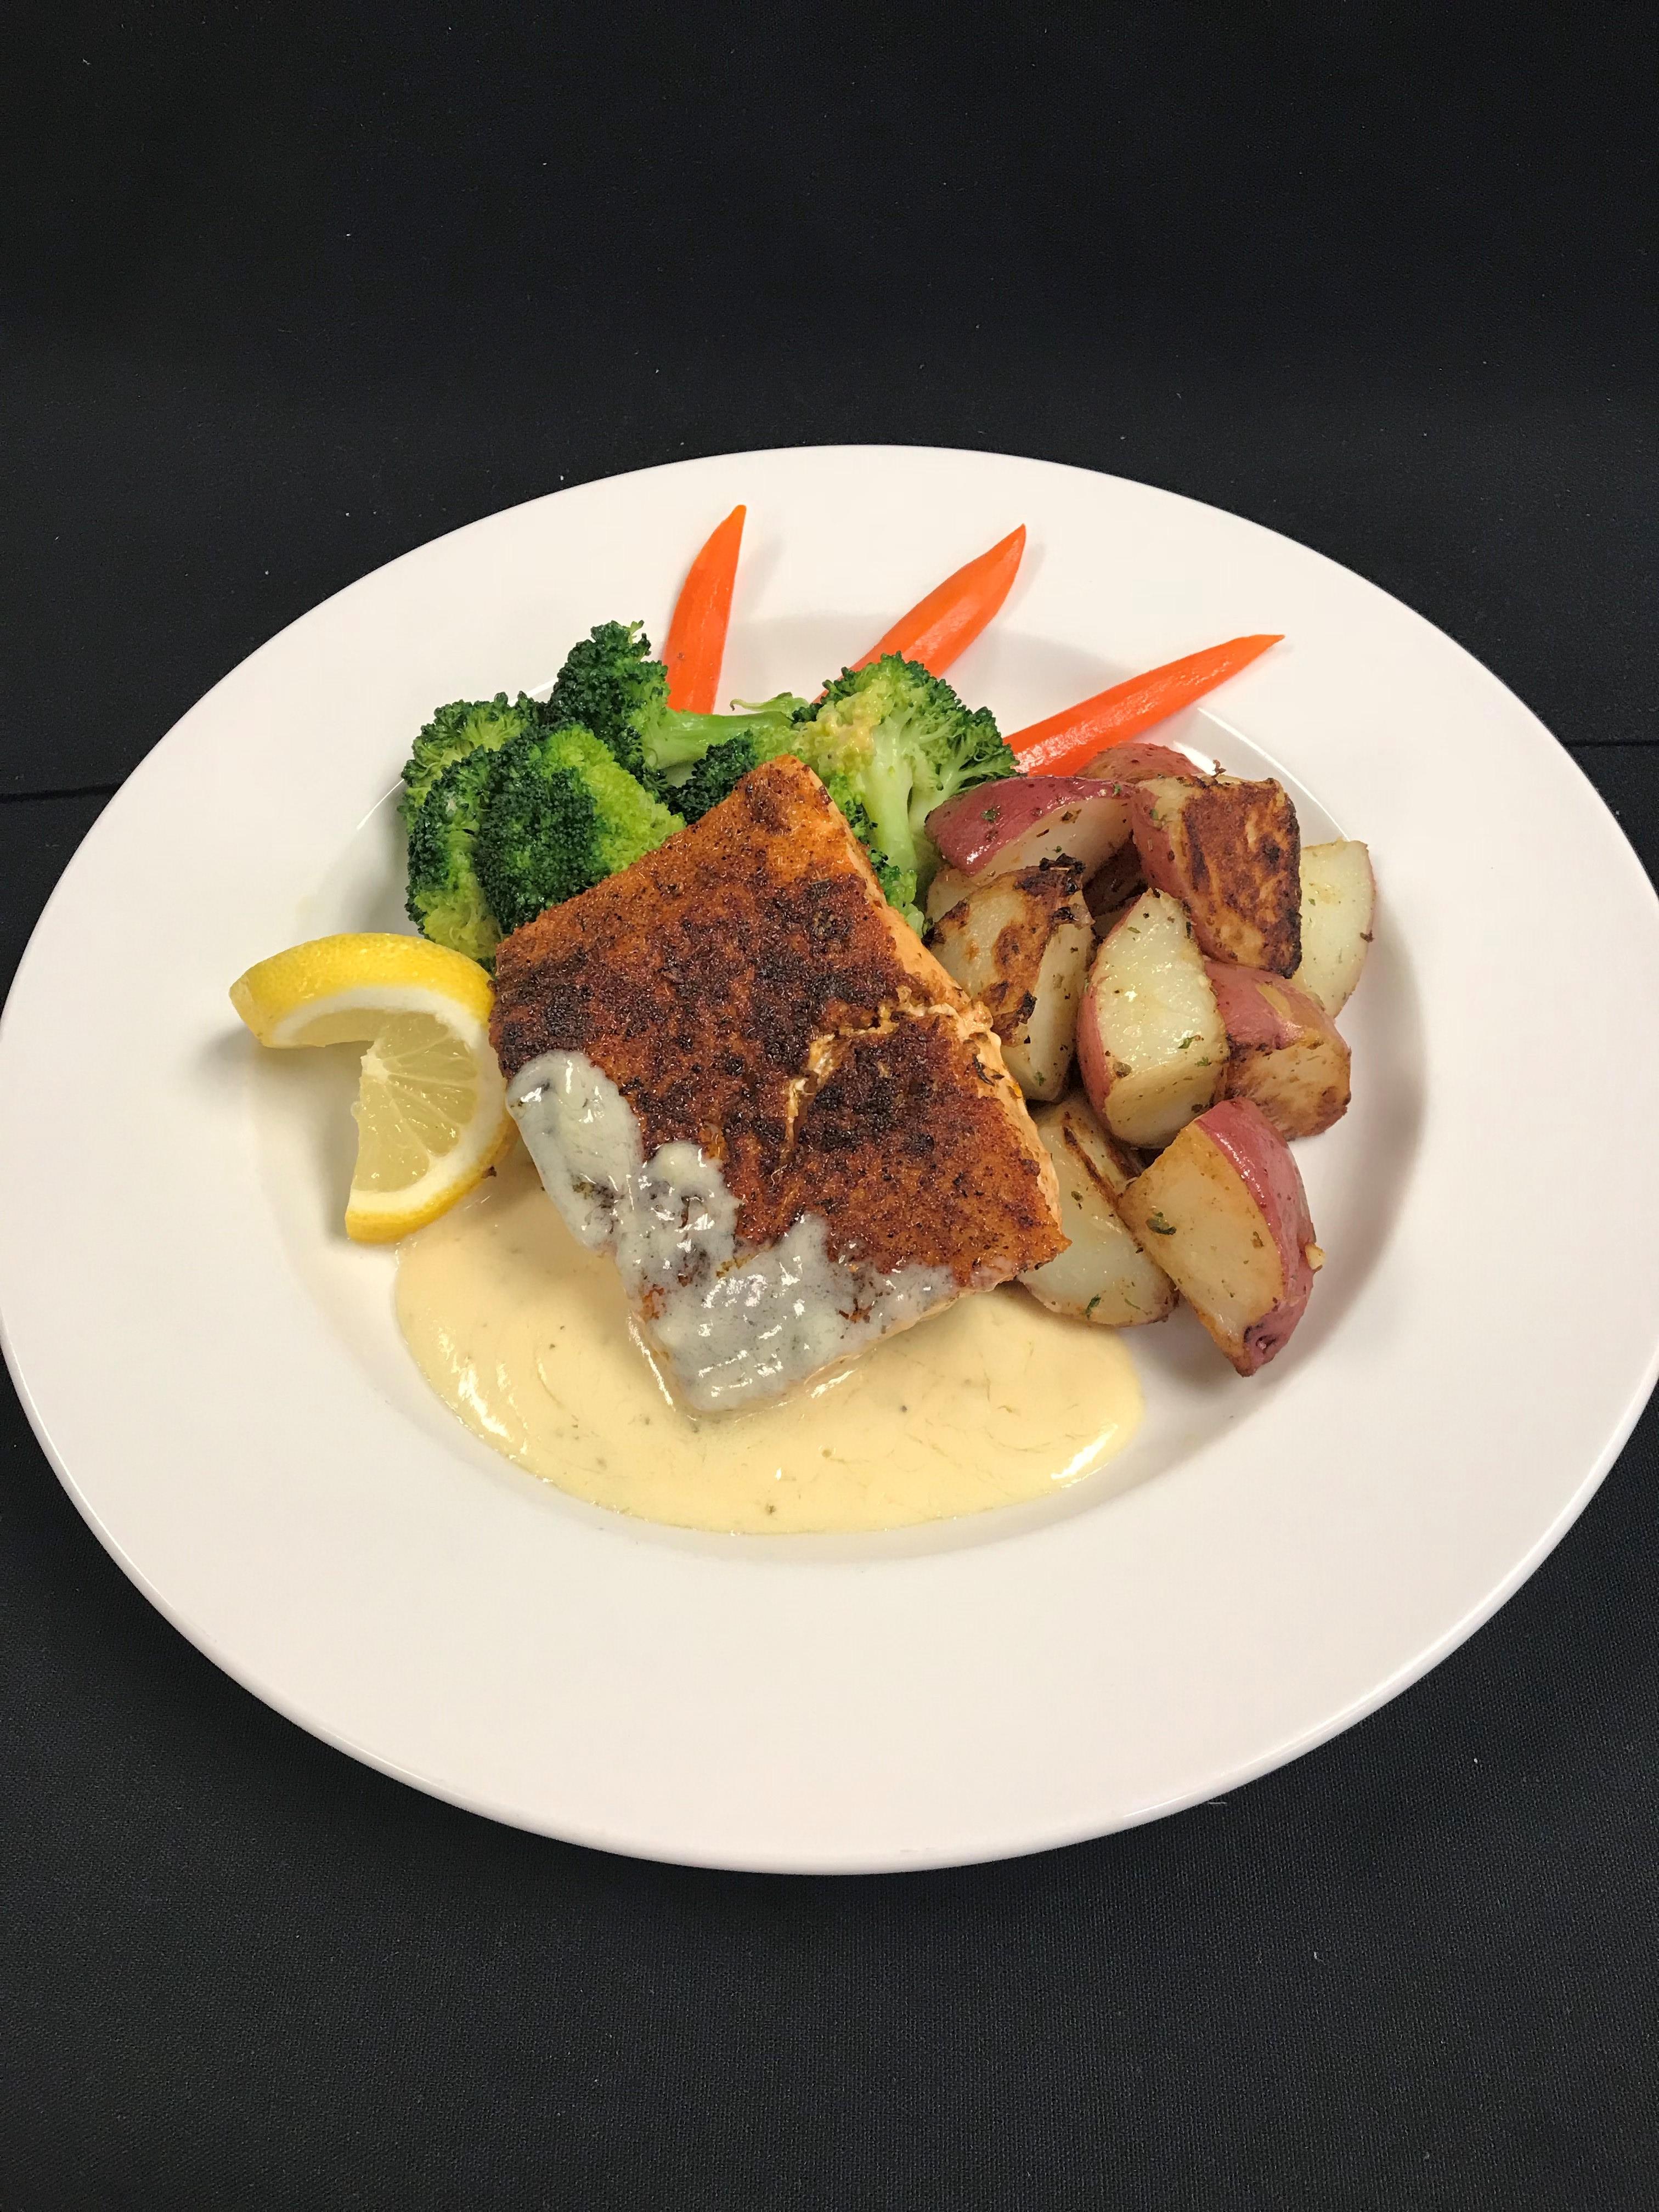 Blackened-Salmon-Plated-Dinner.jpg